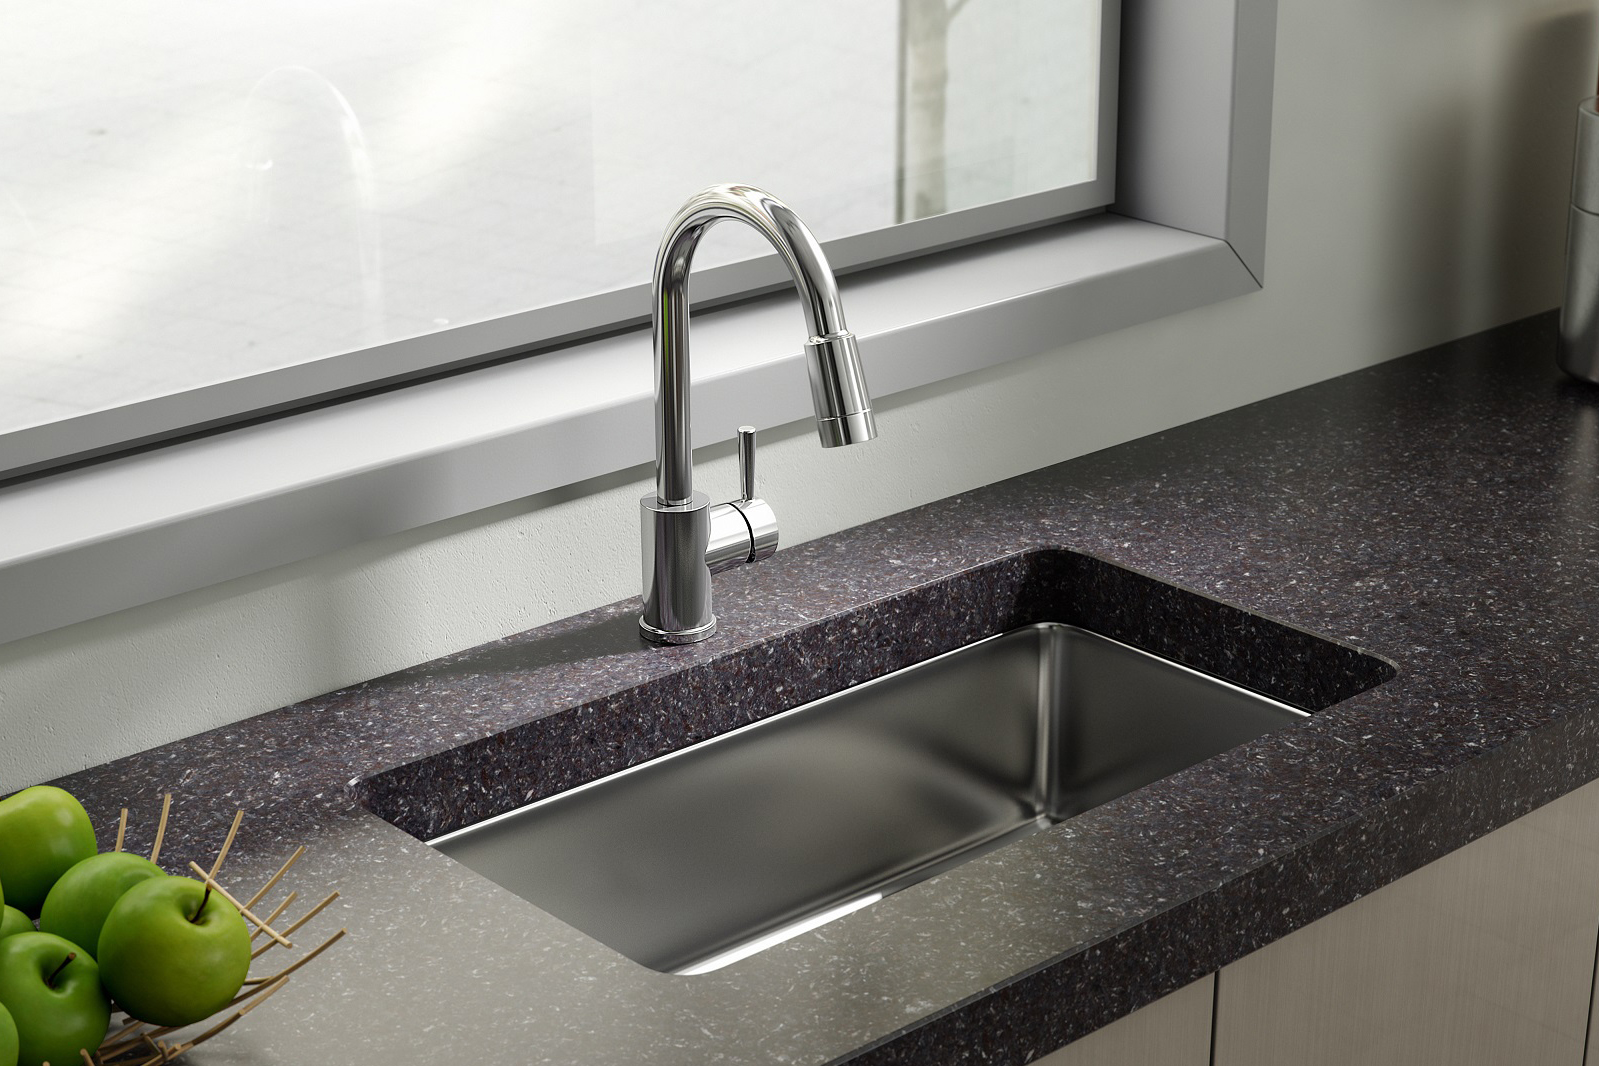 Cfg Introduces Edgestone Faucet Suite For Multifamily K Amp B